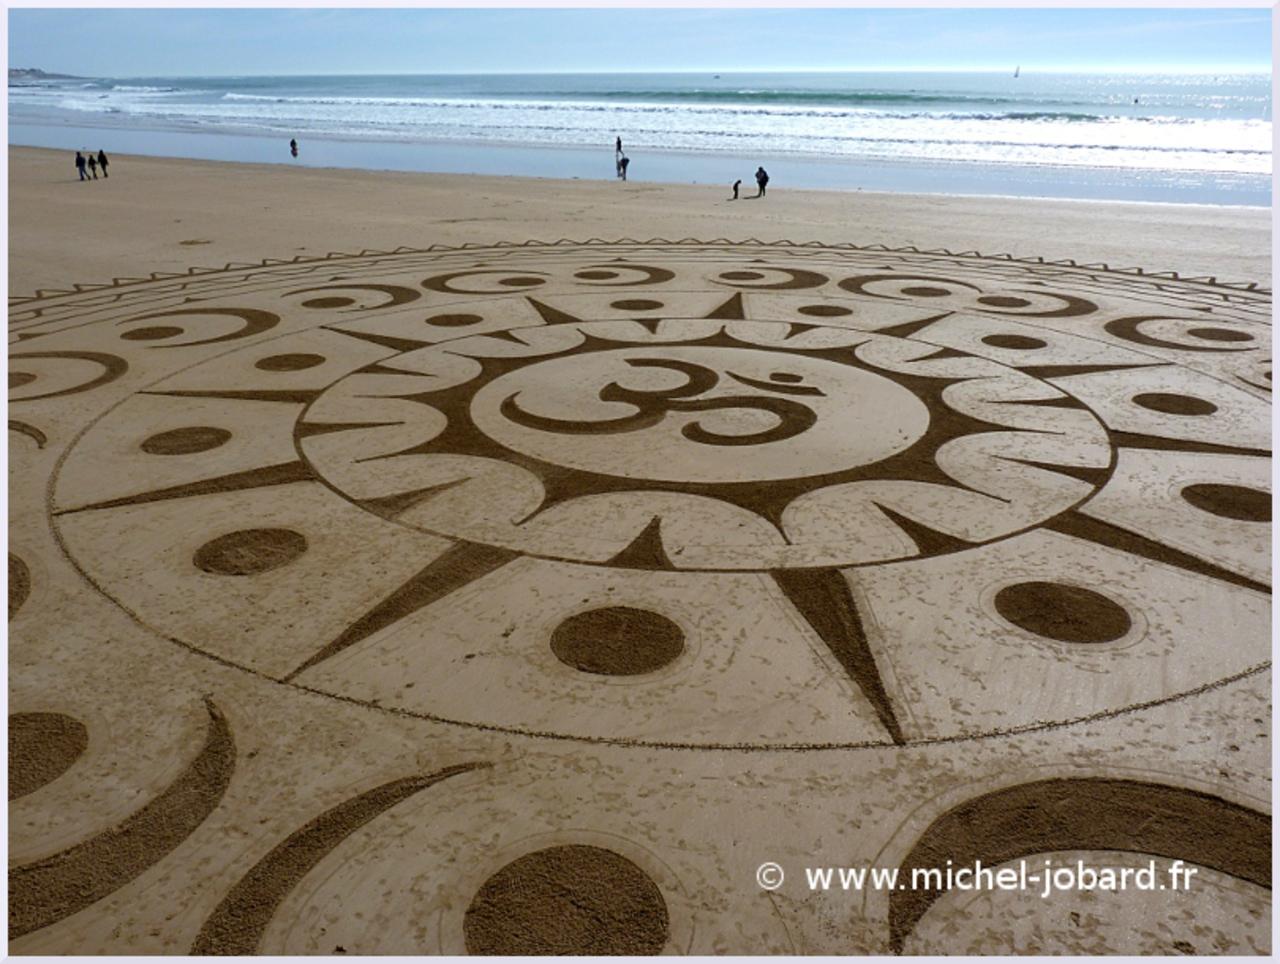 Fresque Sand art Ohm, Michel Jobard